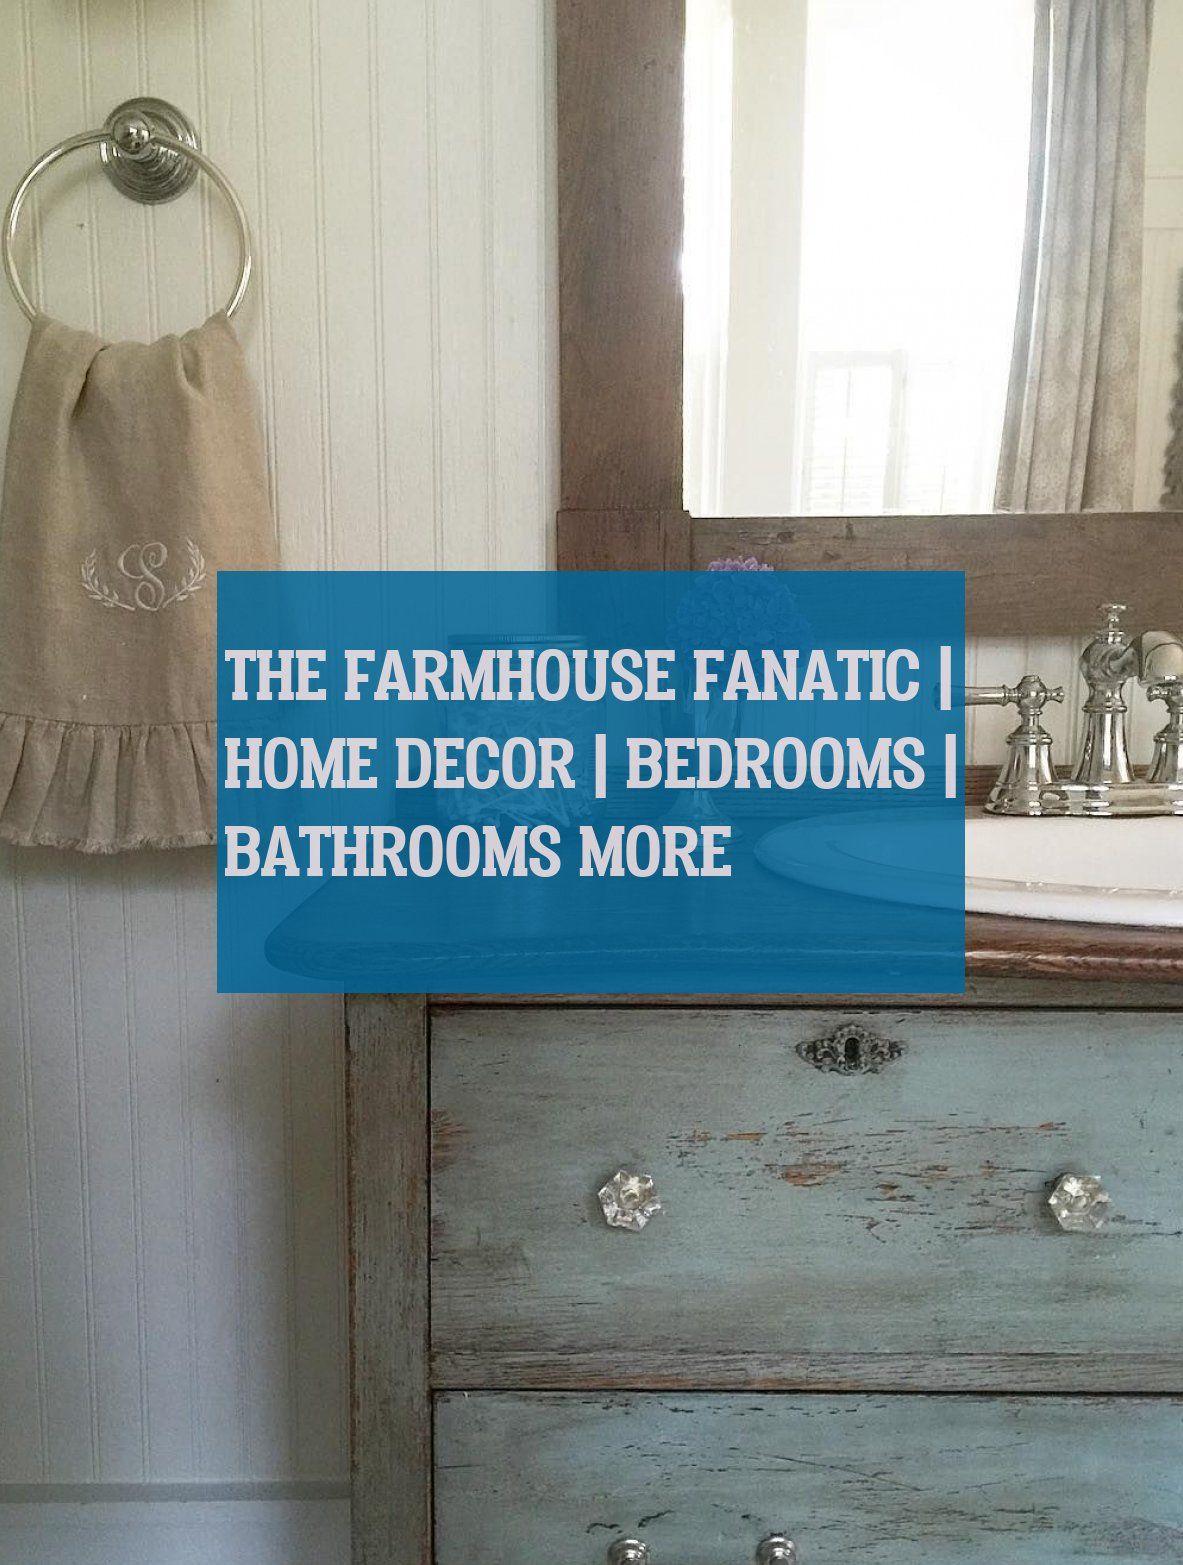 the farmhouse fanatic | home decor | bedrooms | bathrooms more